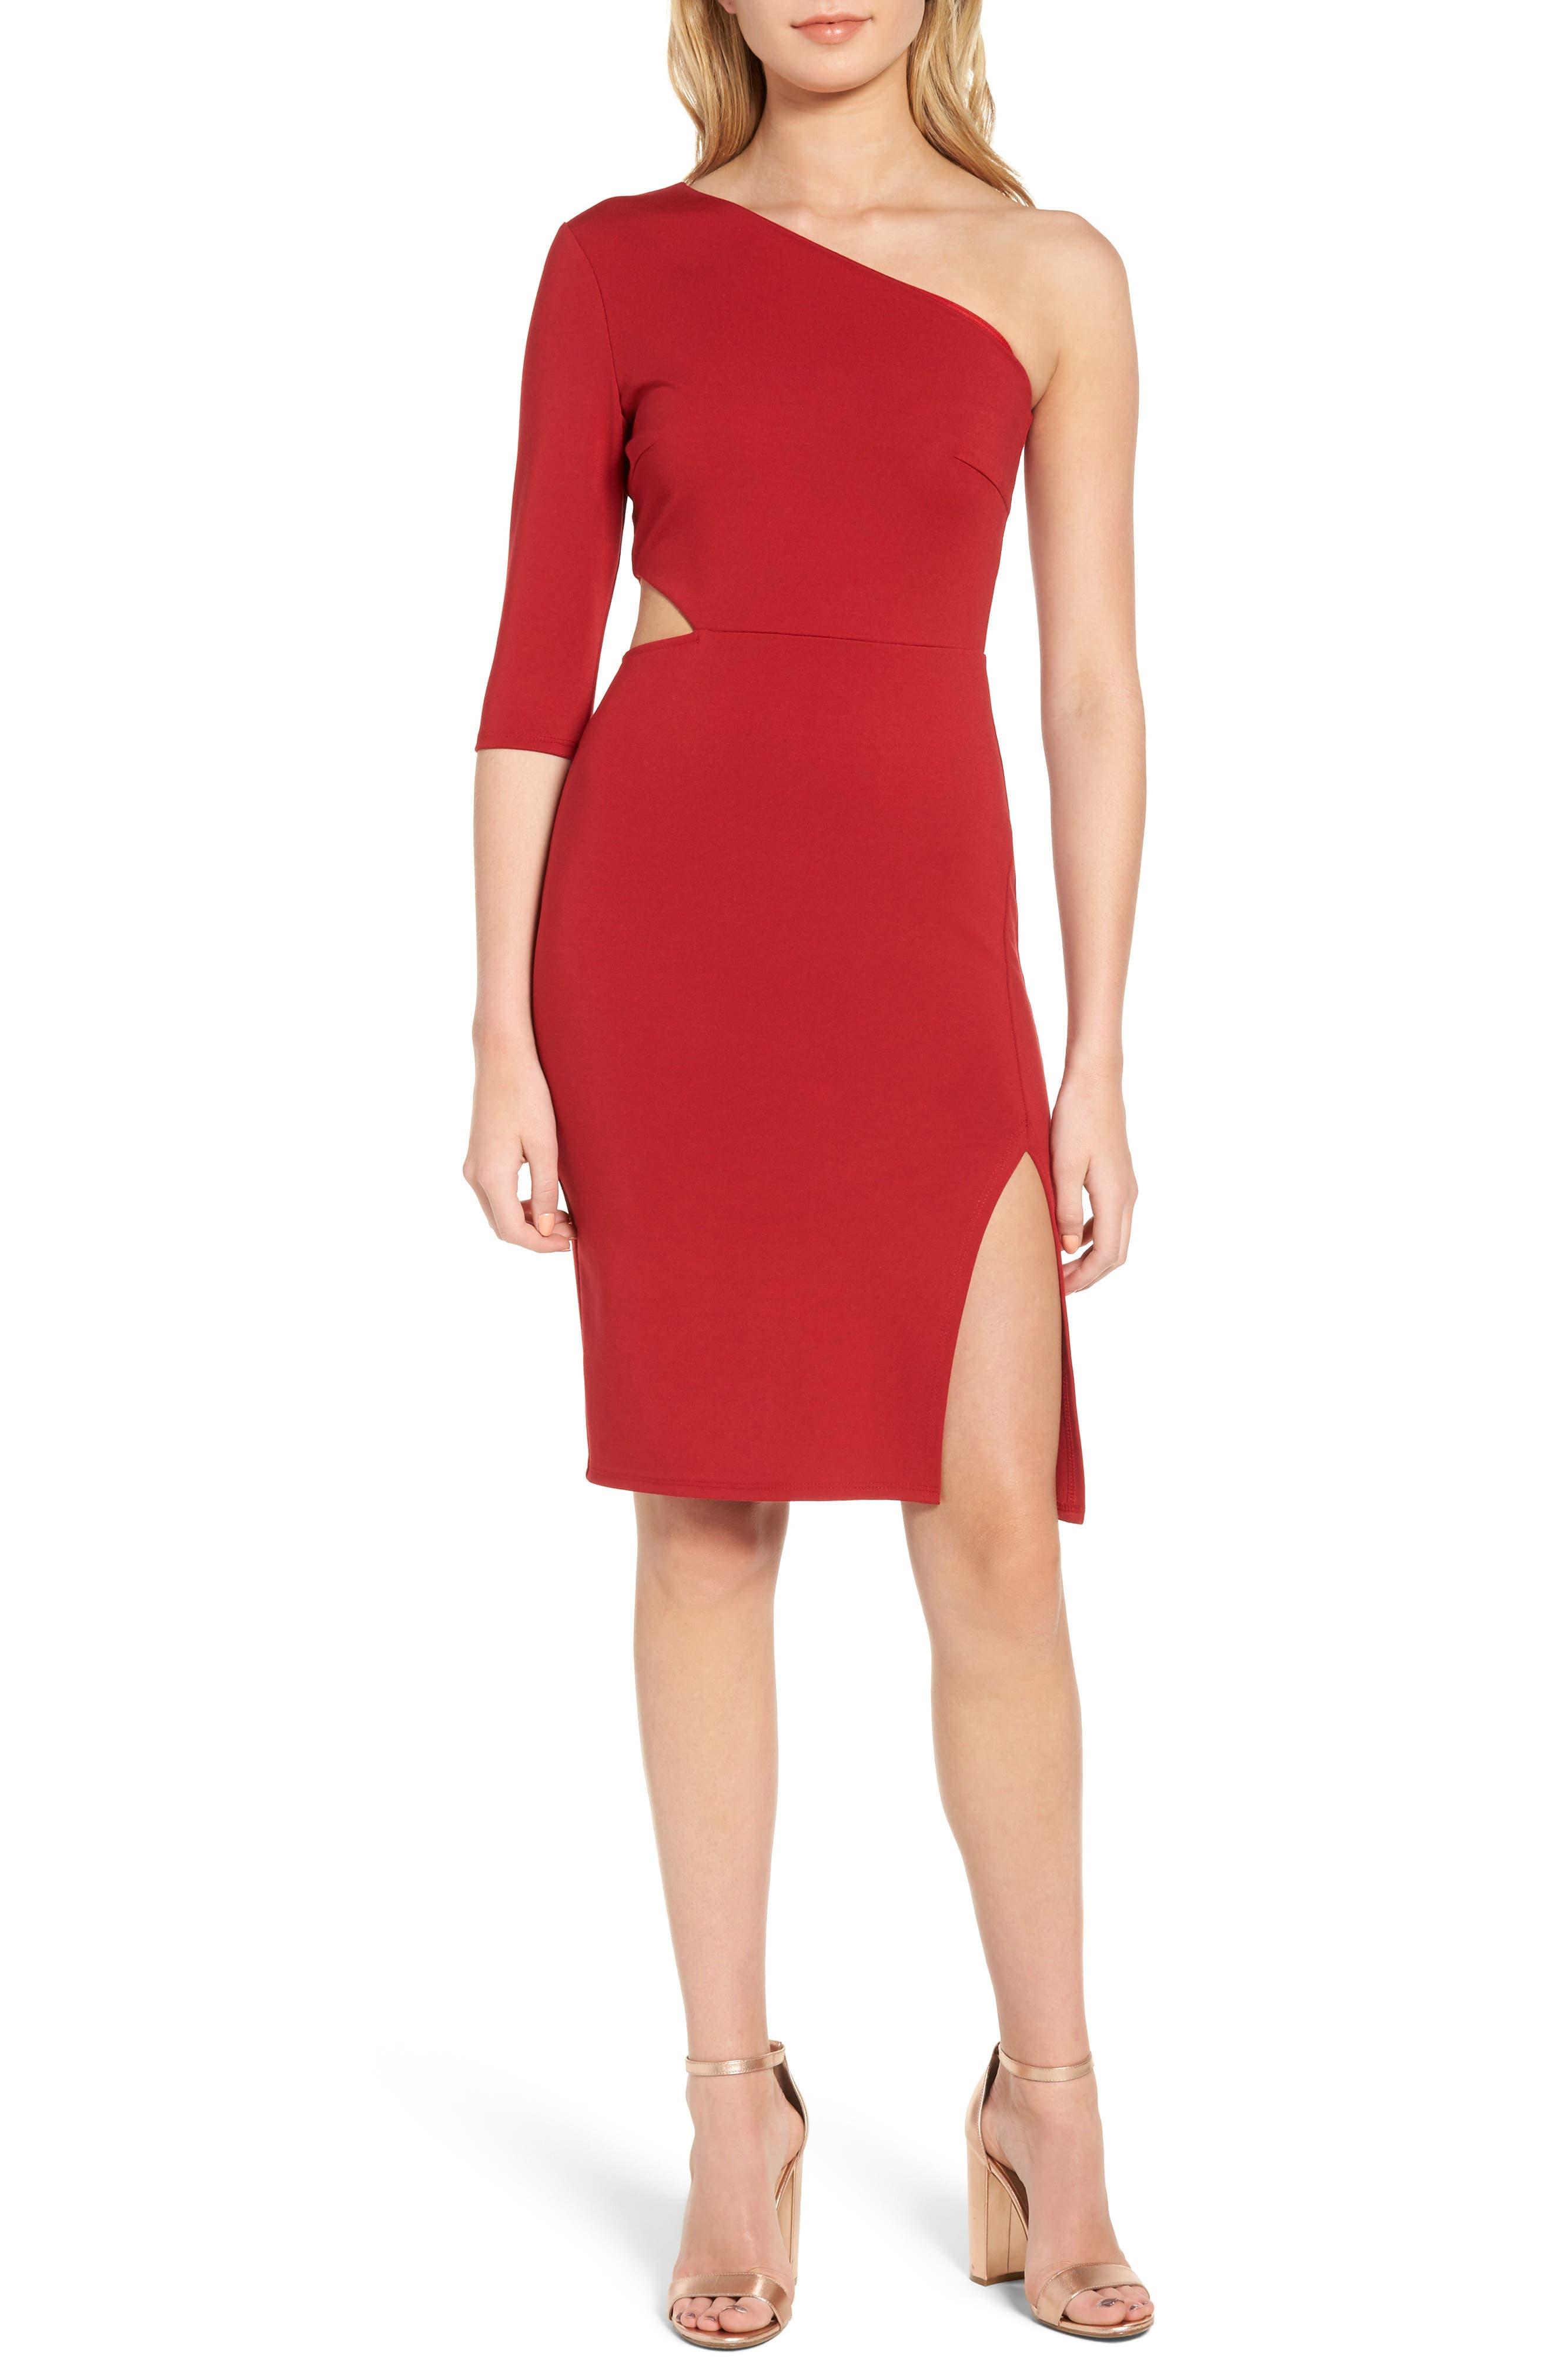 Soprano Side Cutout One-Shoulder Dress